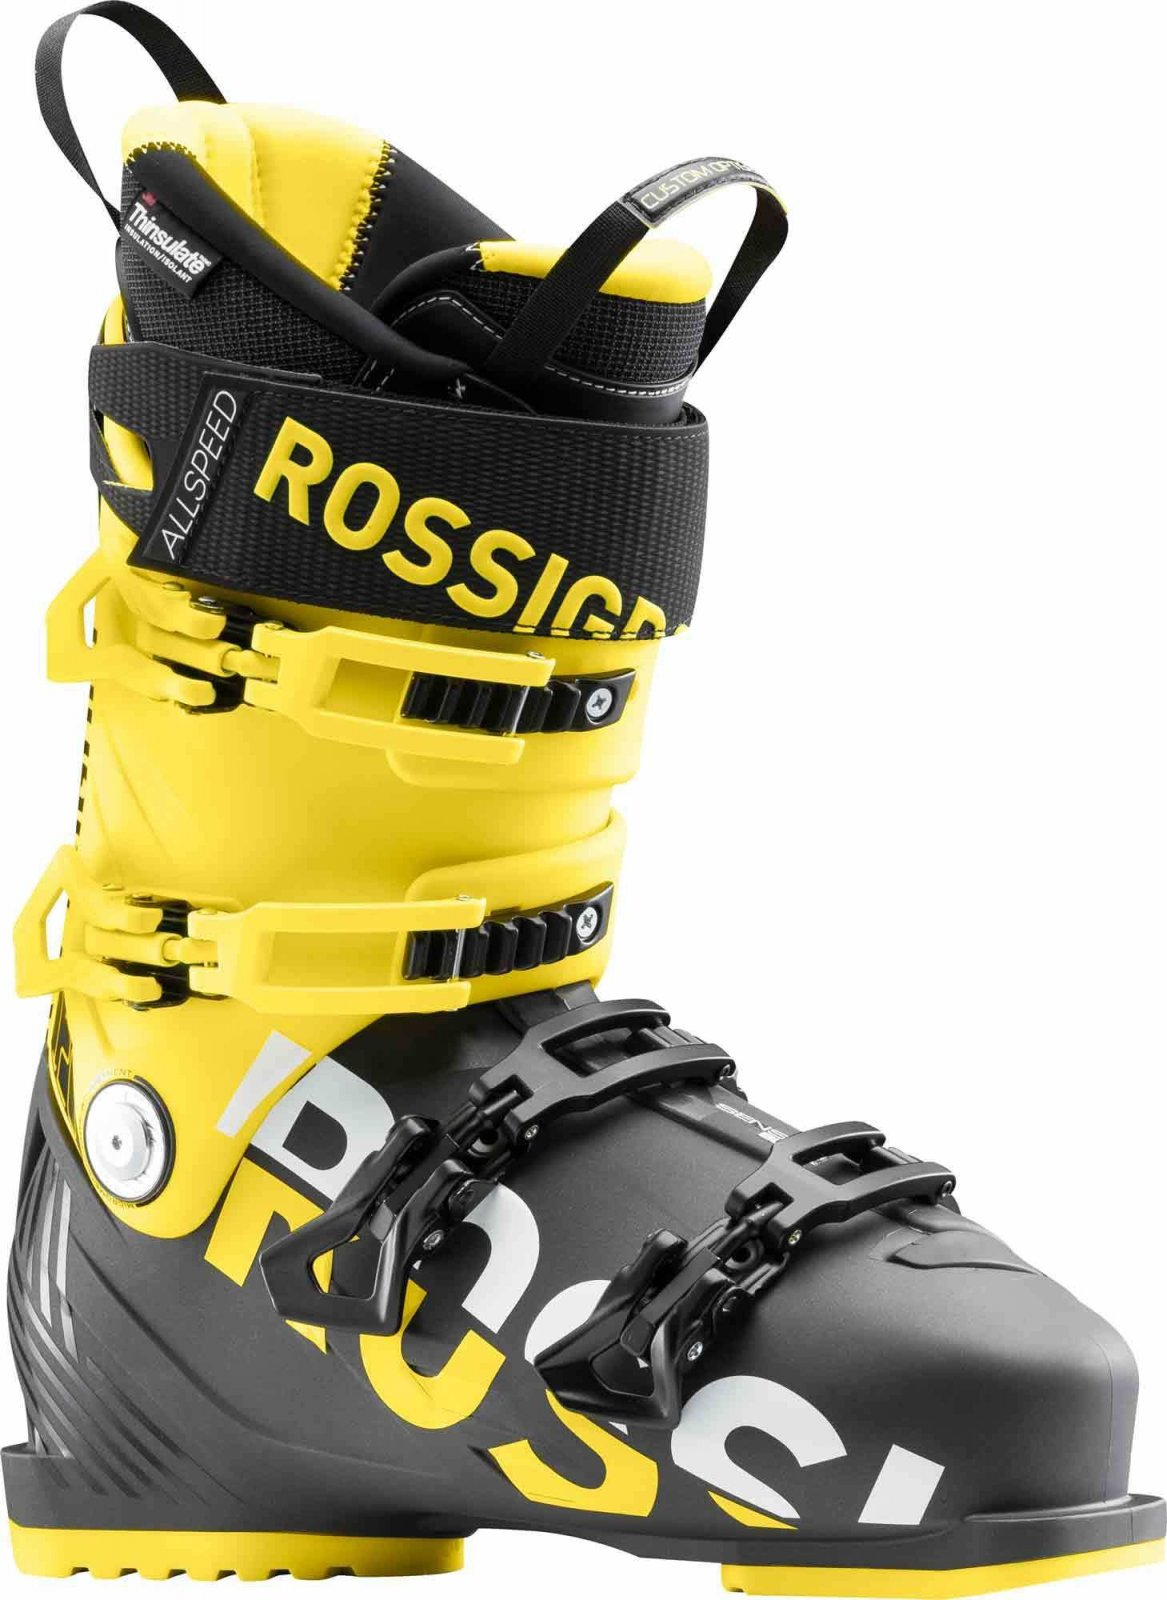 Rossignol Allspeed 120 Ski Boots 2019